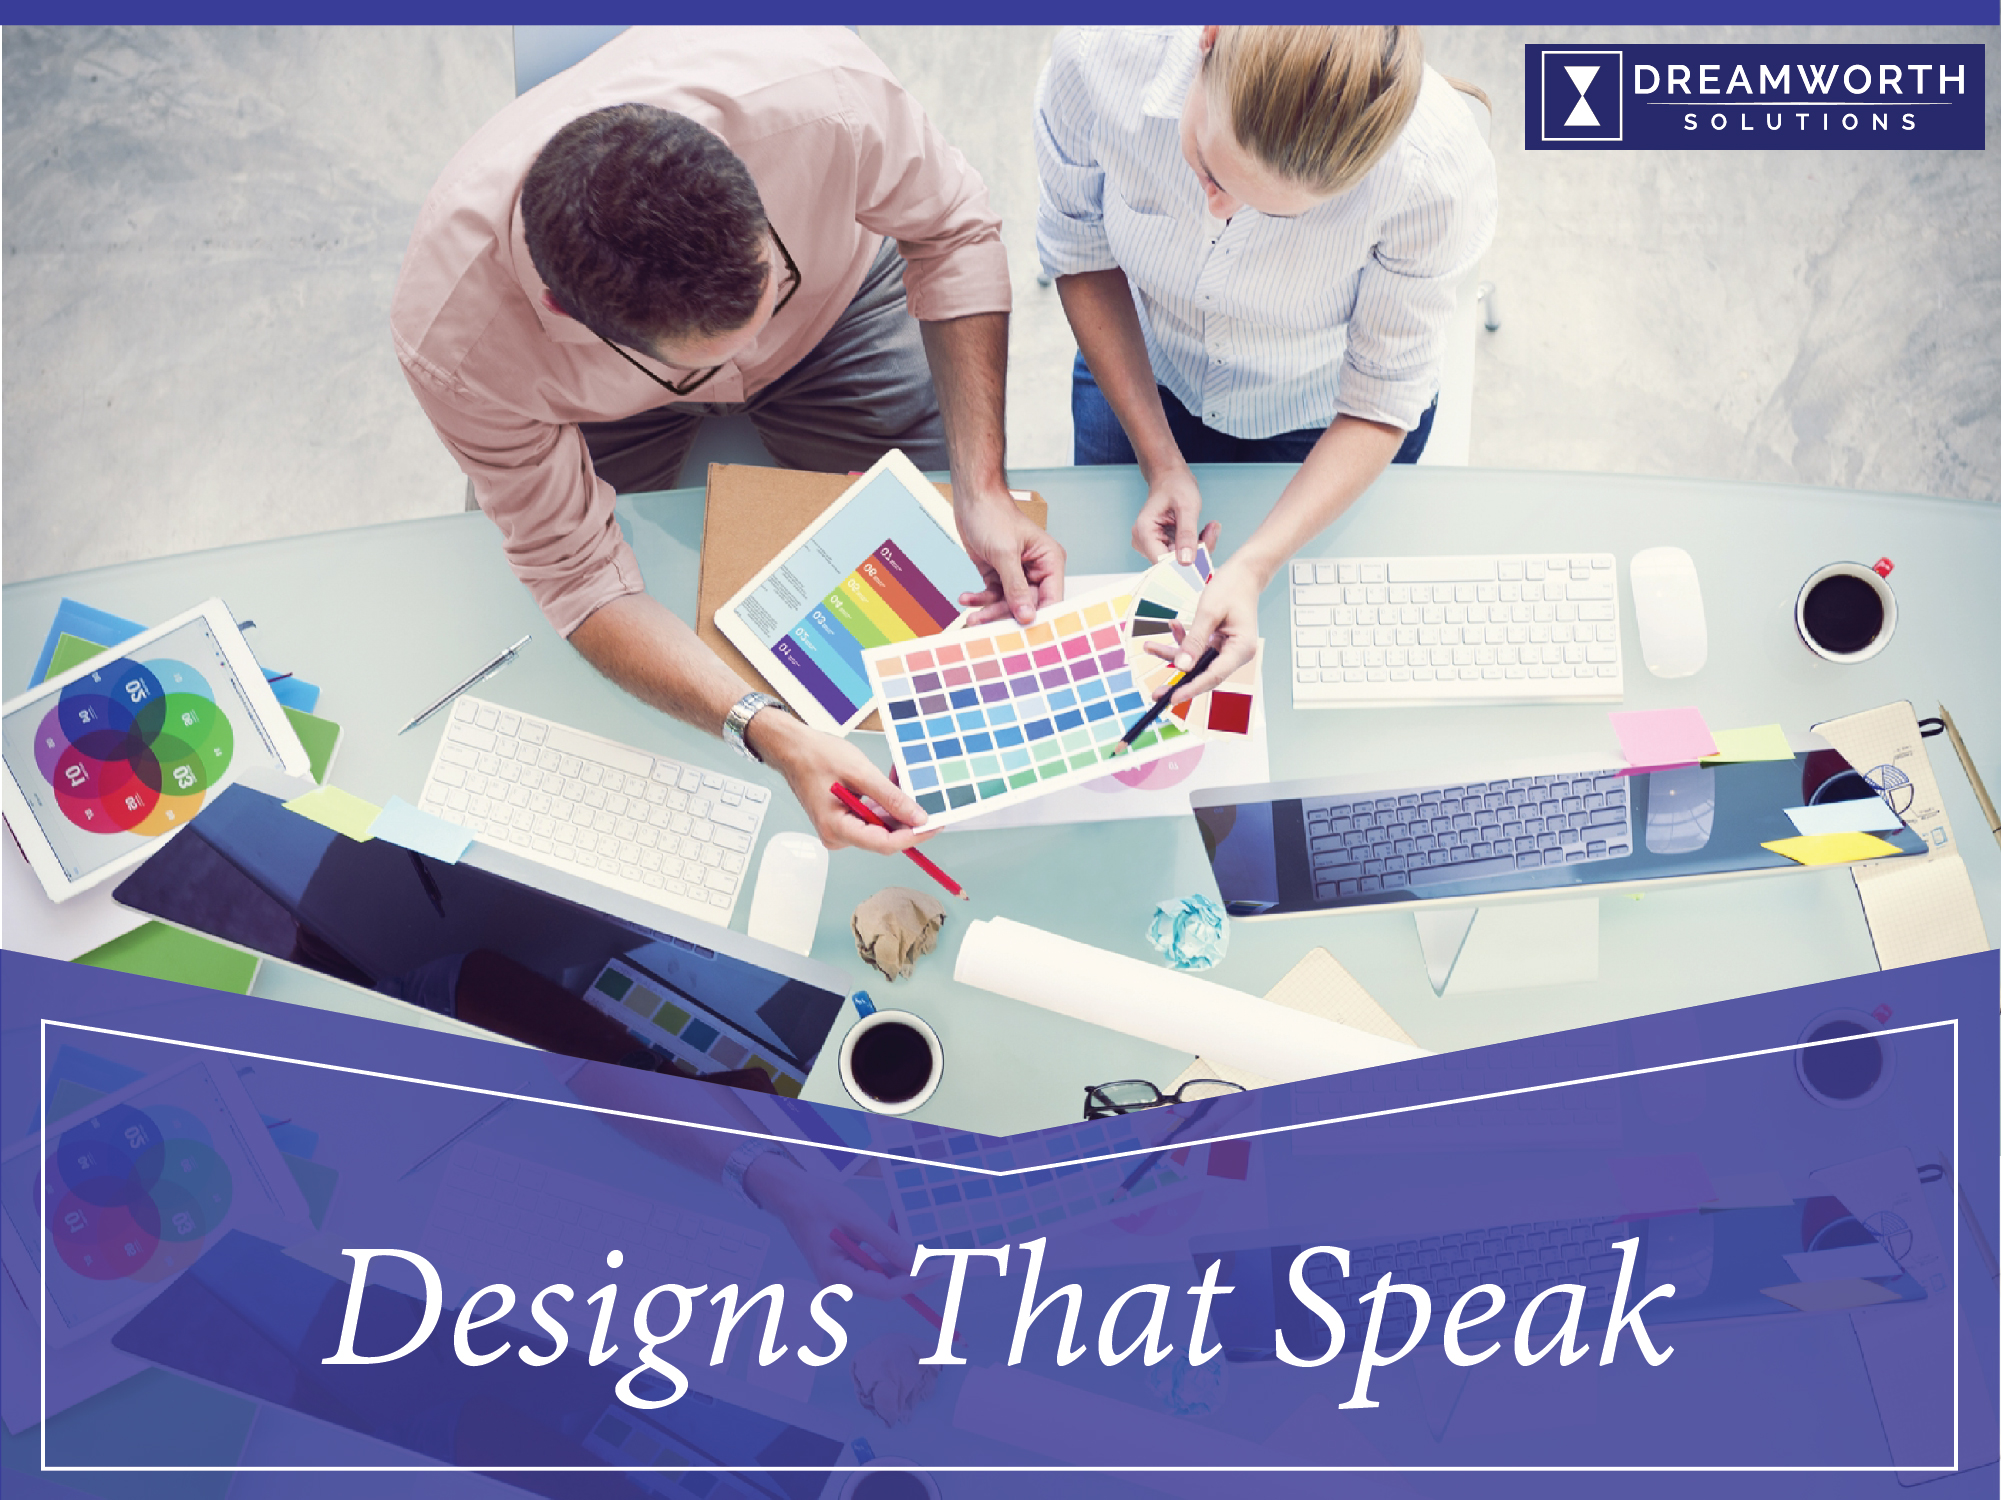 Dreamworth provides best digital marketing services